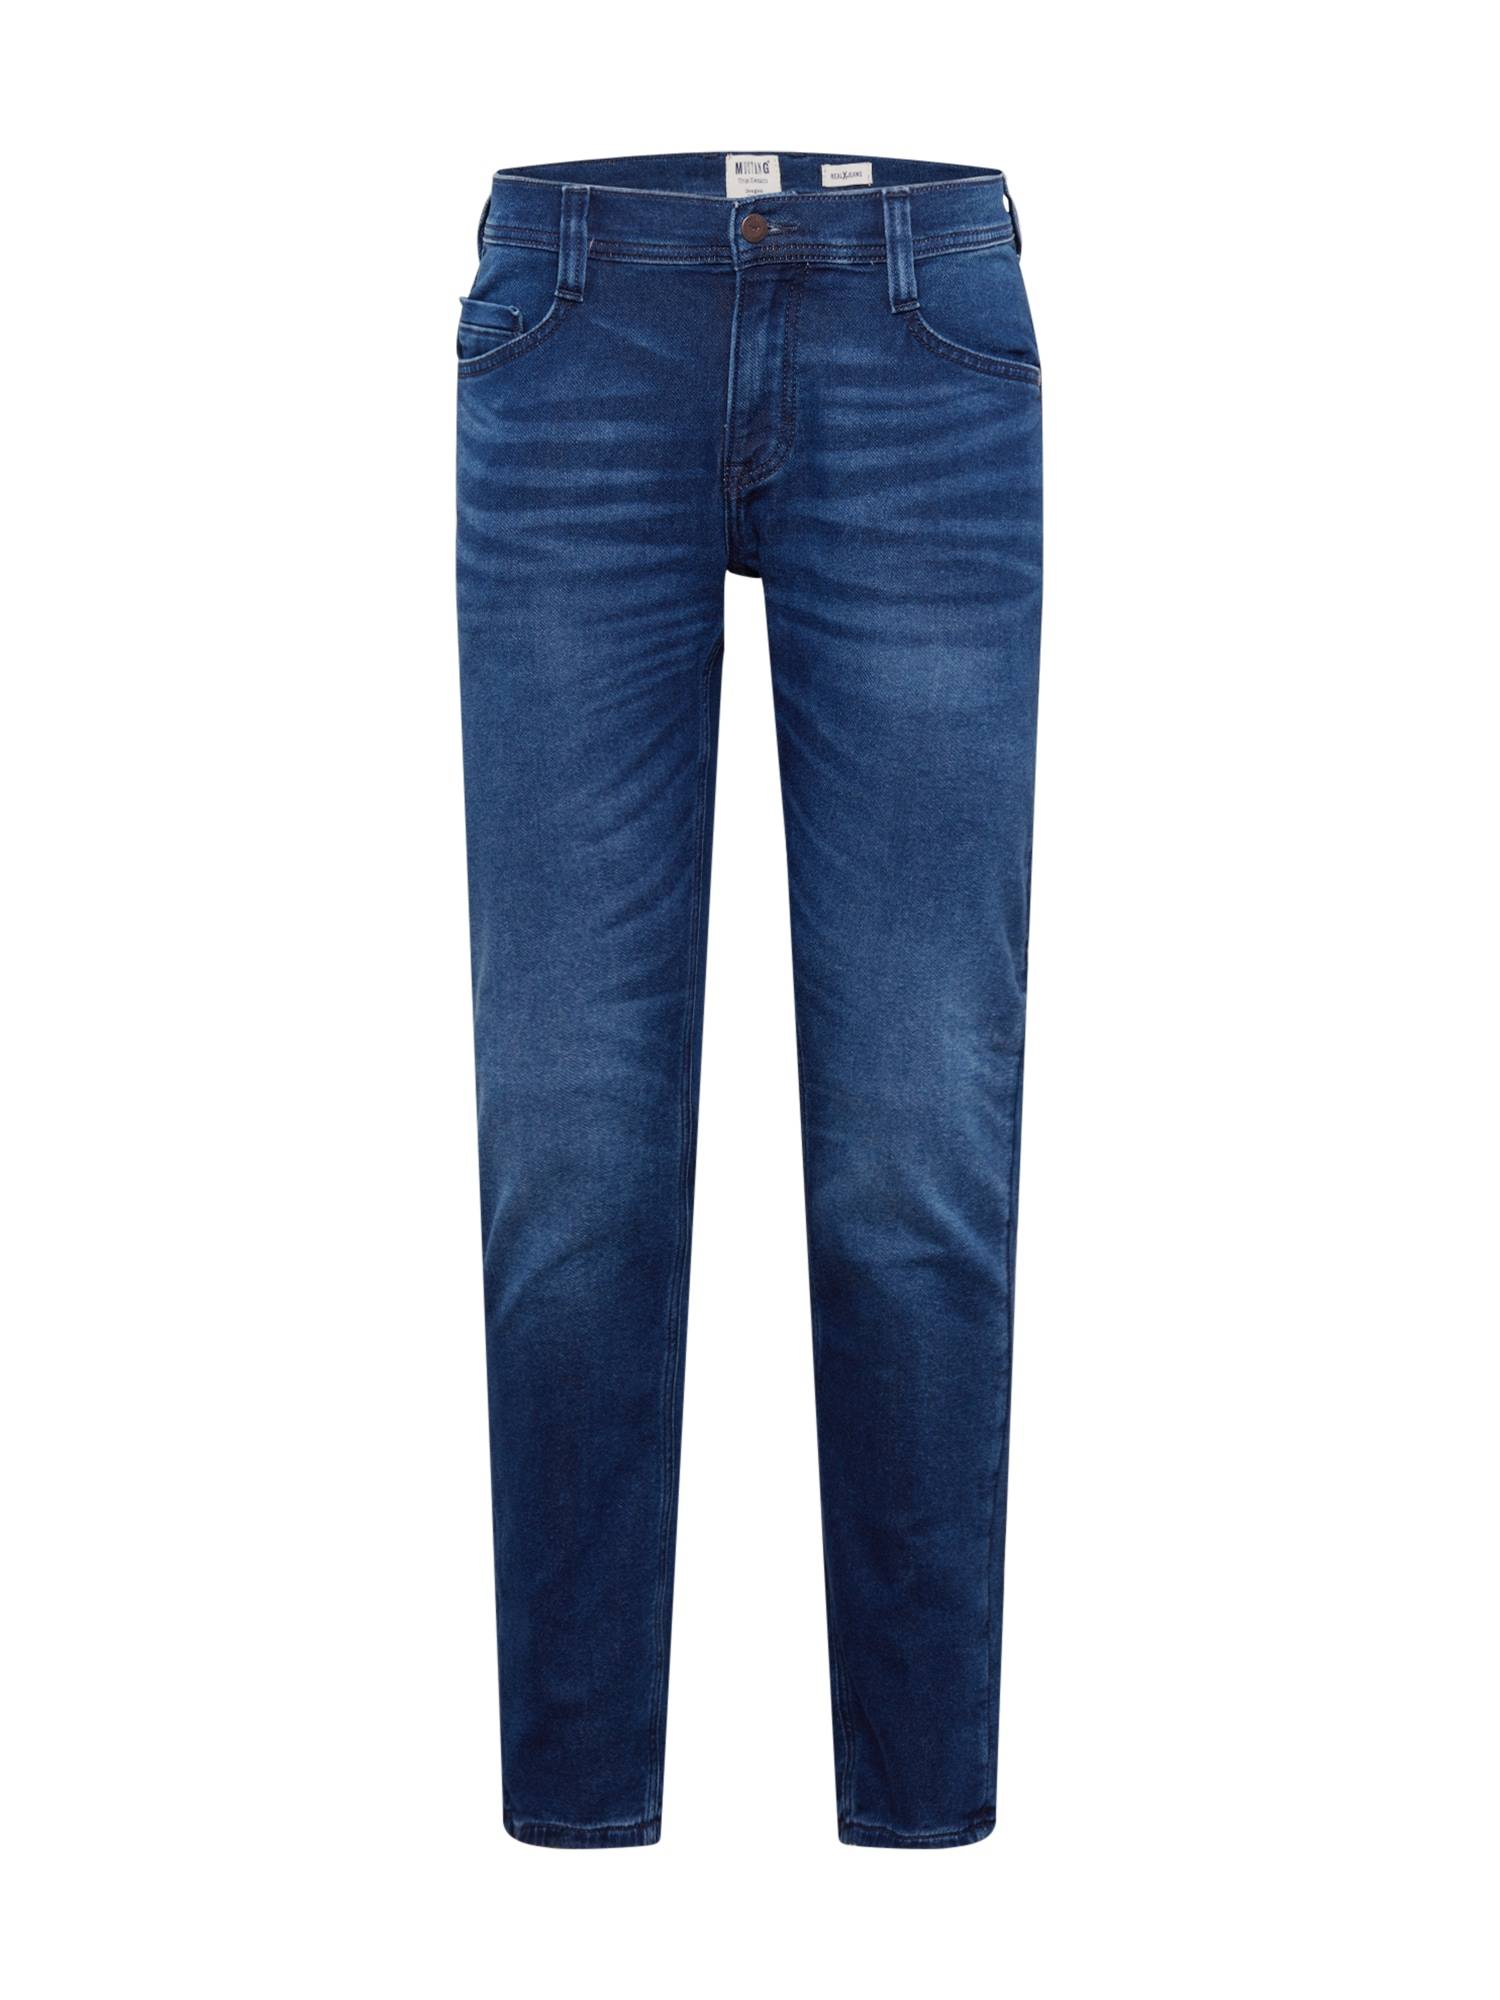 MUSTANG Jean 'Oregon'  - Bleu - Taille: 30 - male